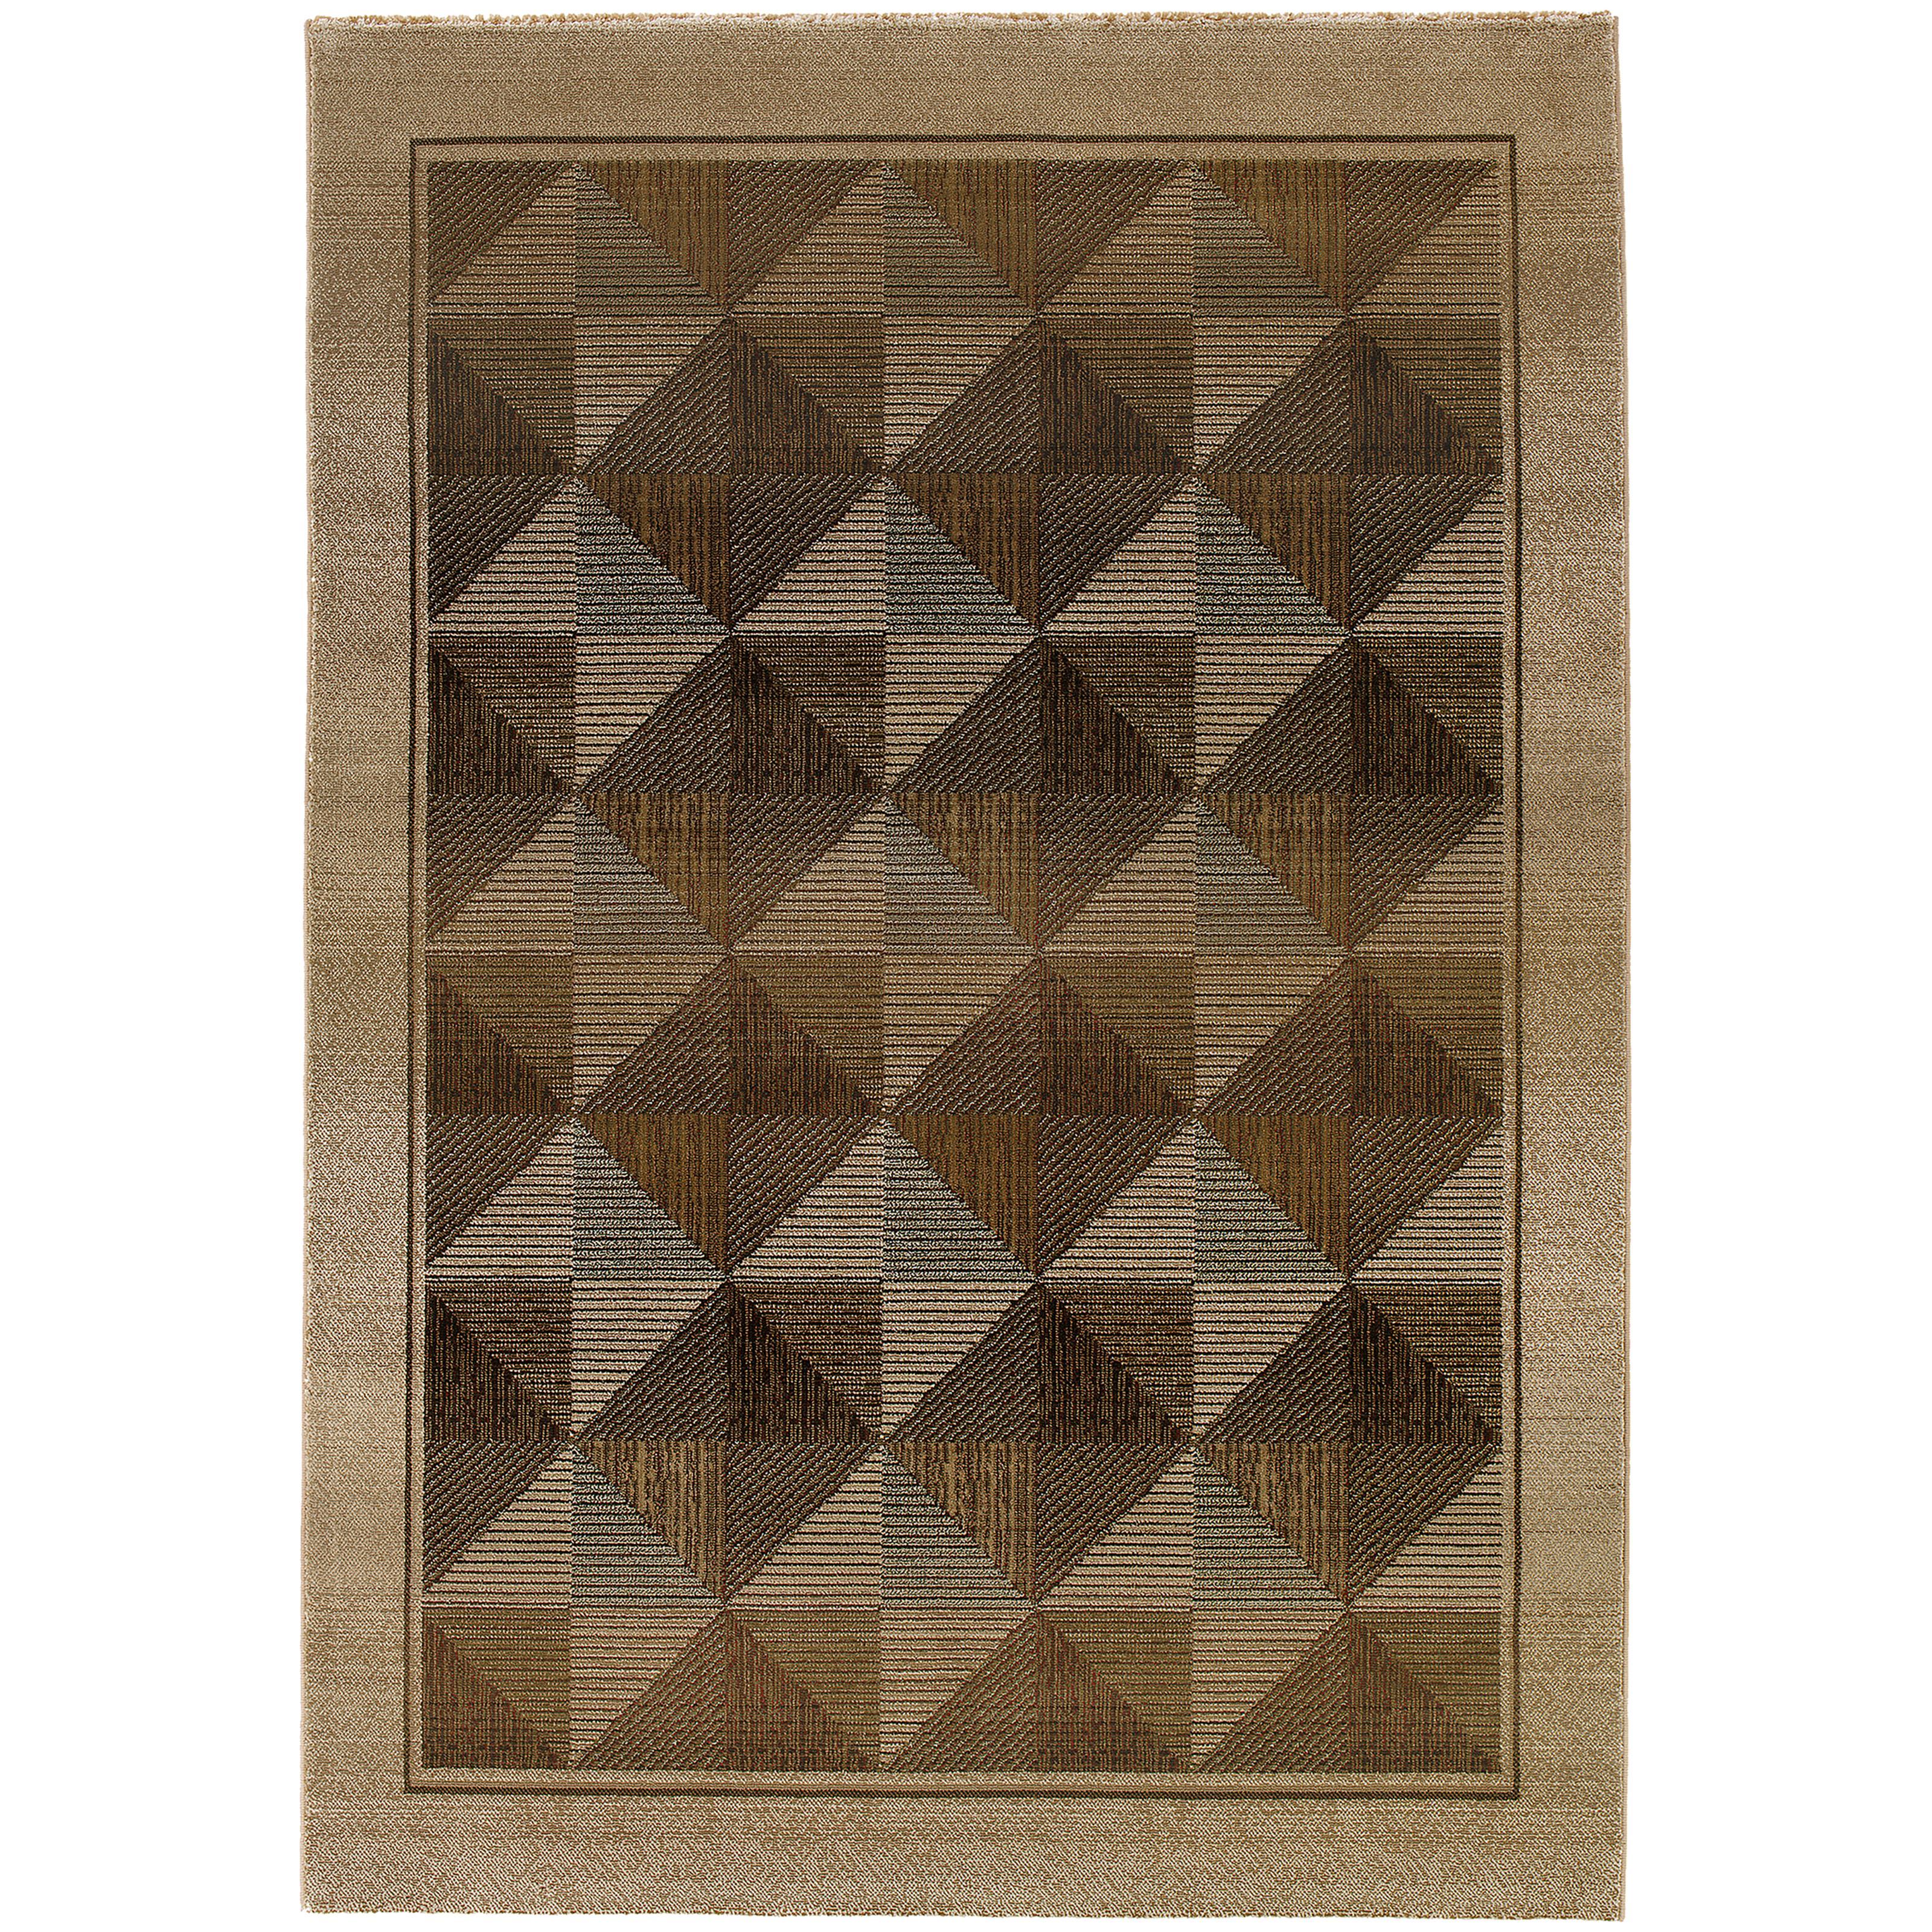 "Oriental Weavers Generations 7'10"" X 11' Rug - Item Number: G252J1240340ST"